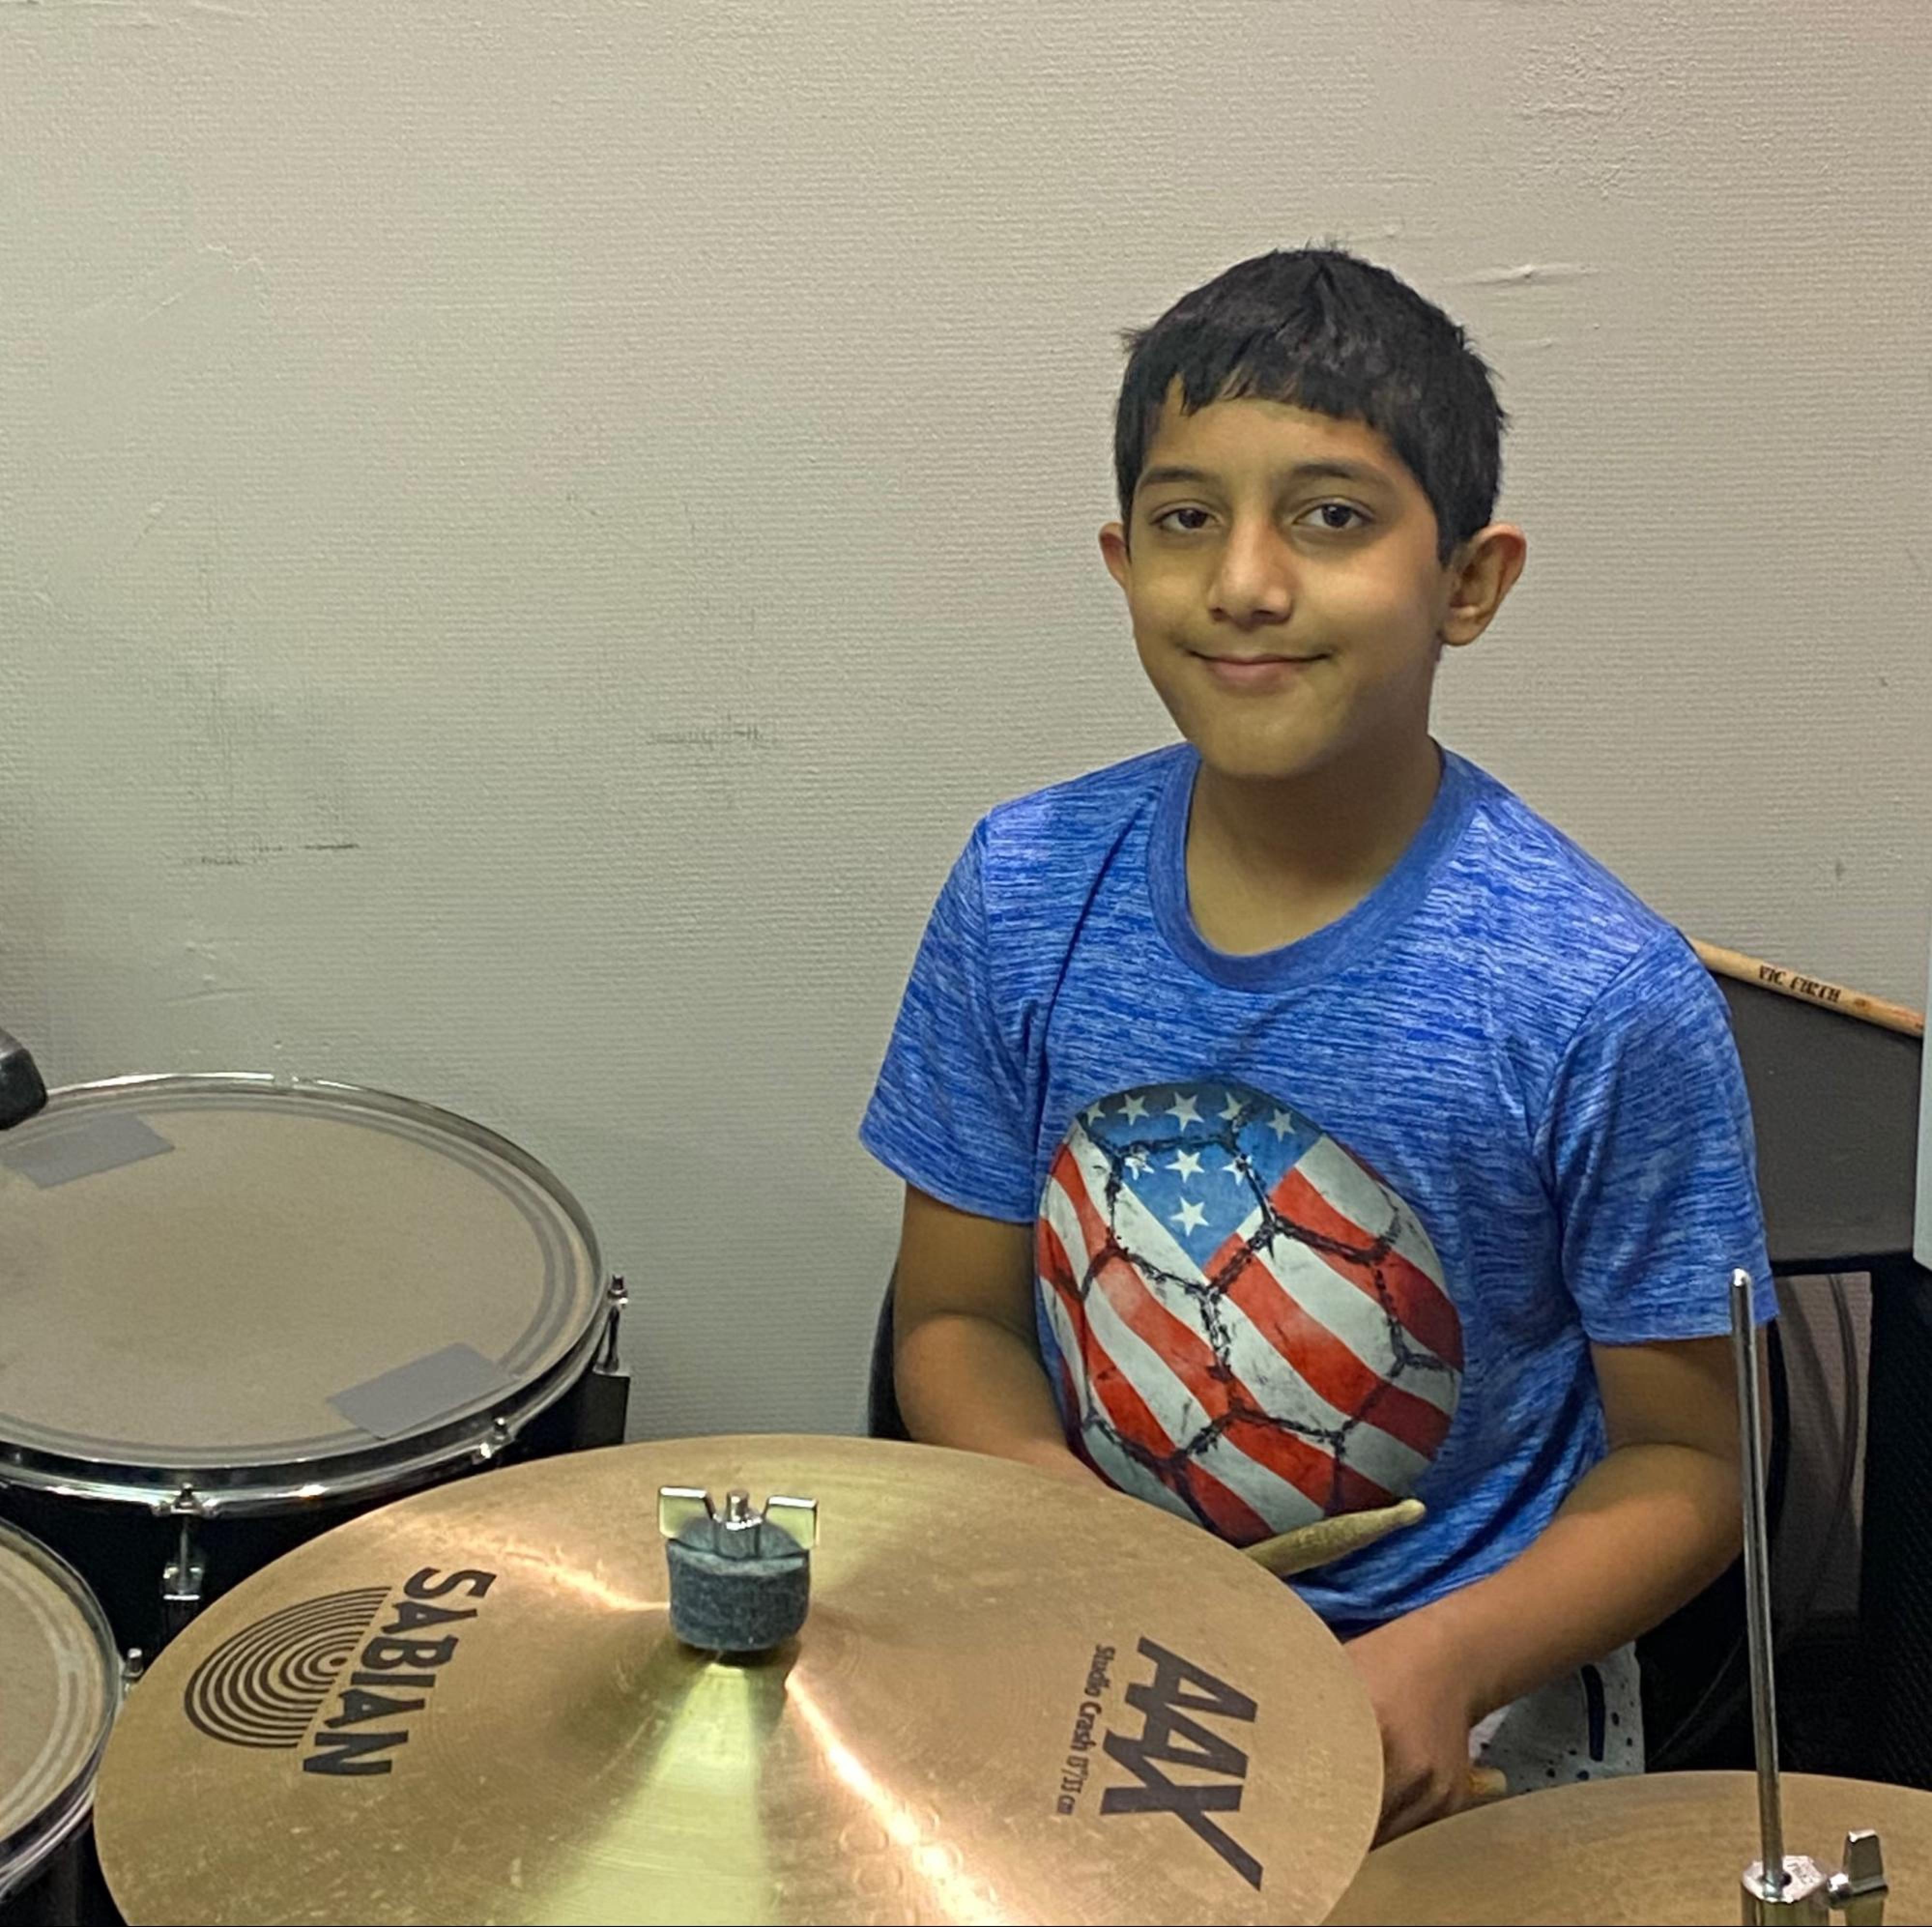 drum lessons near me in edison nj